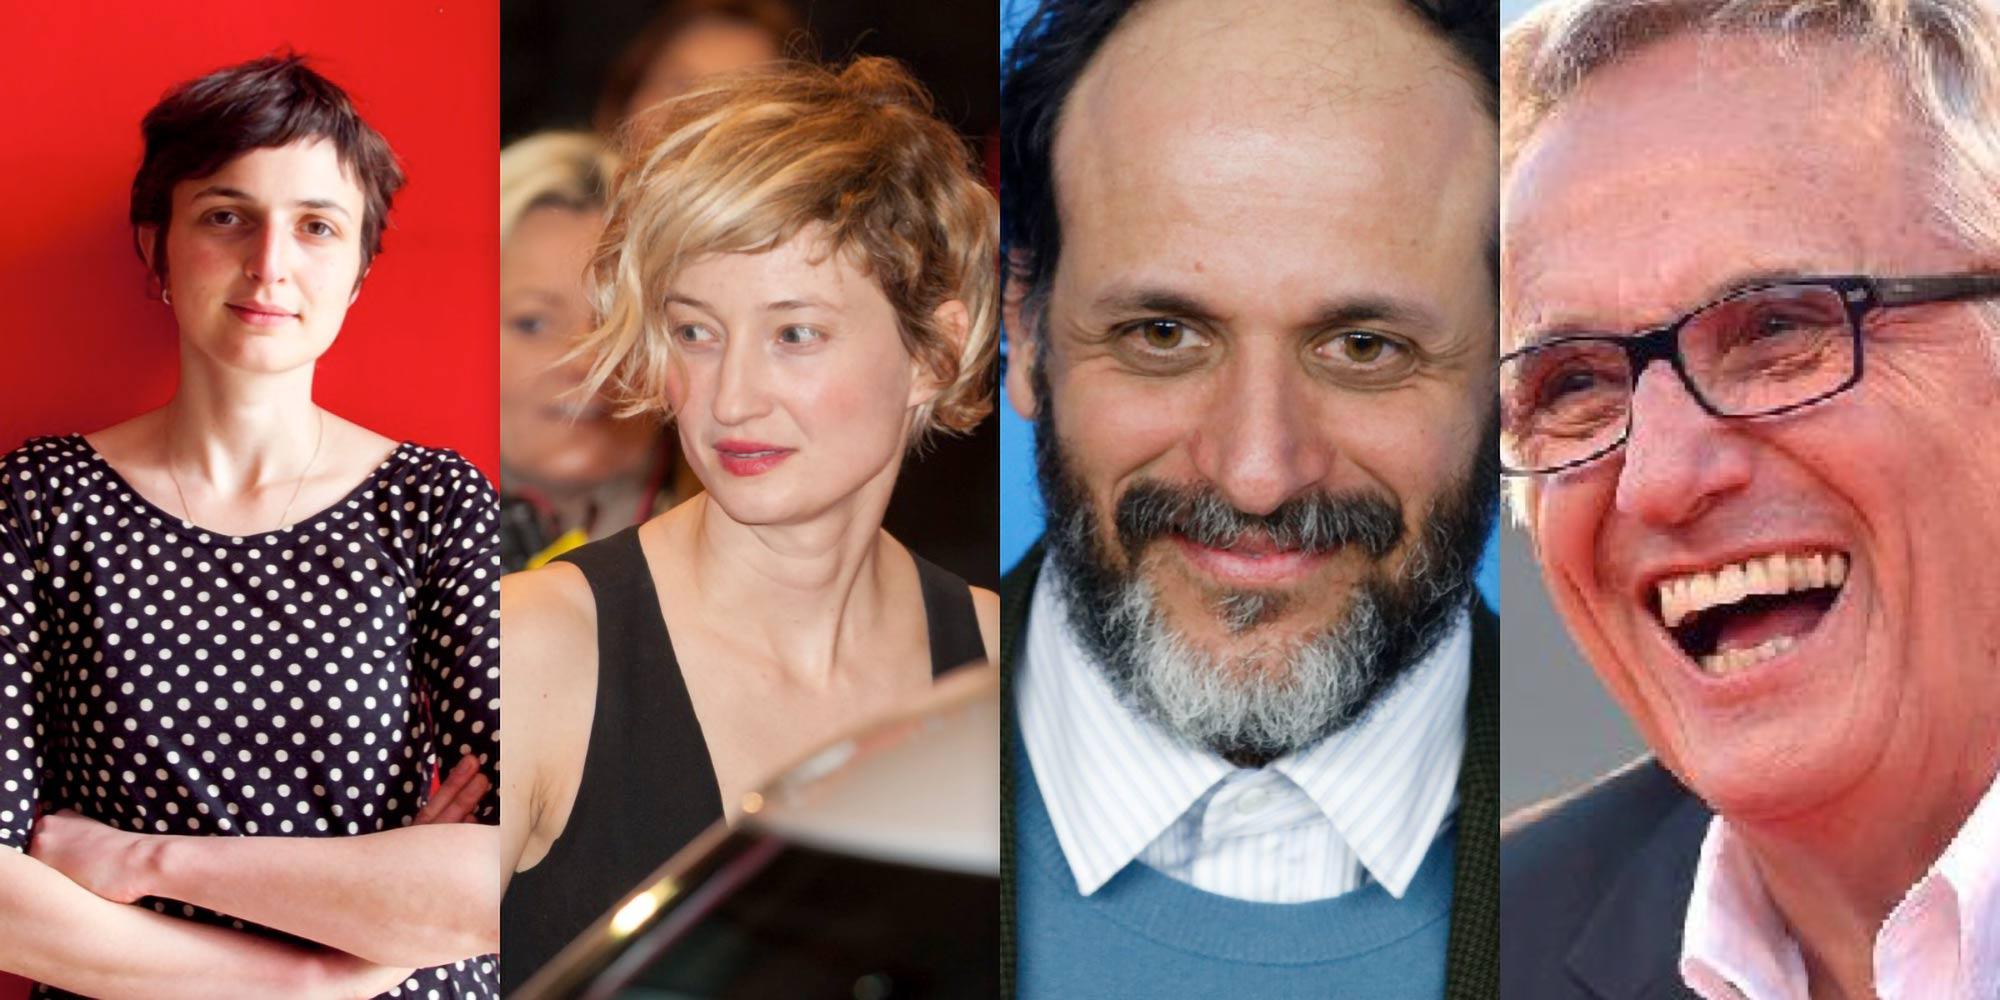 Oscars Jury welcomes Guadagnino, Alice and Alba Rohrwacher and Bellocchio